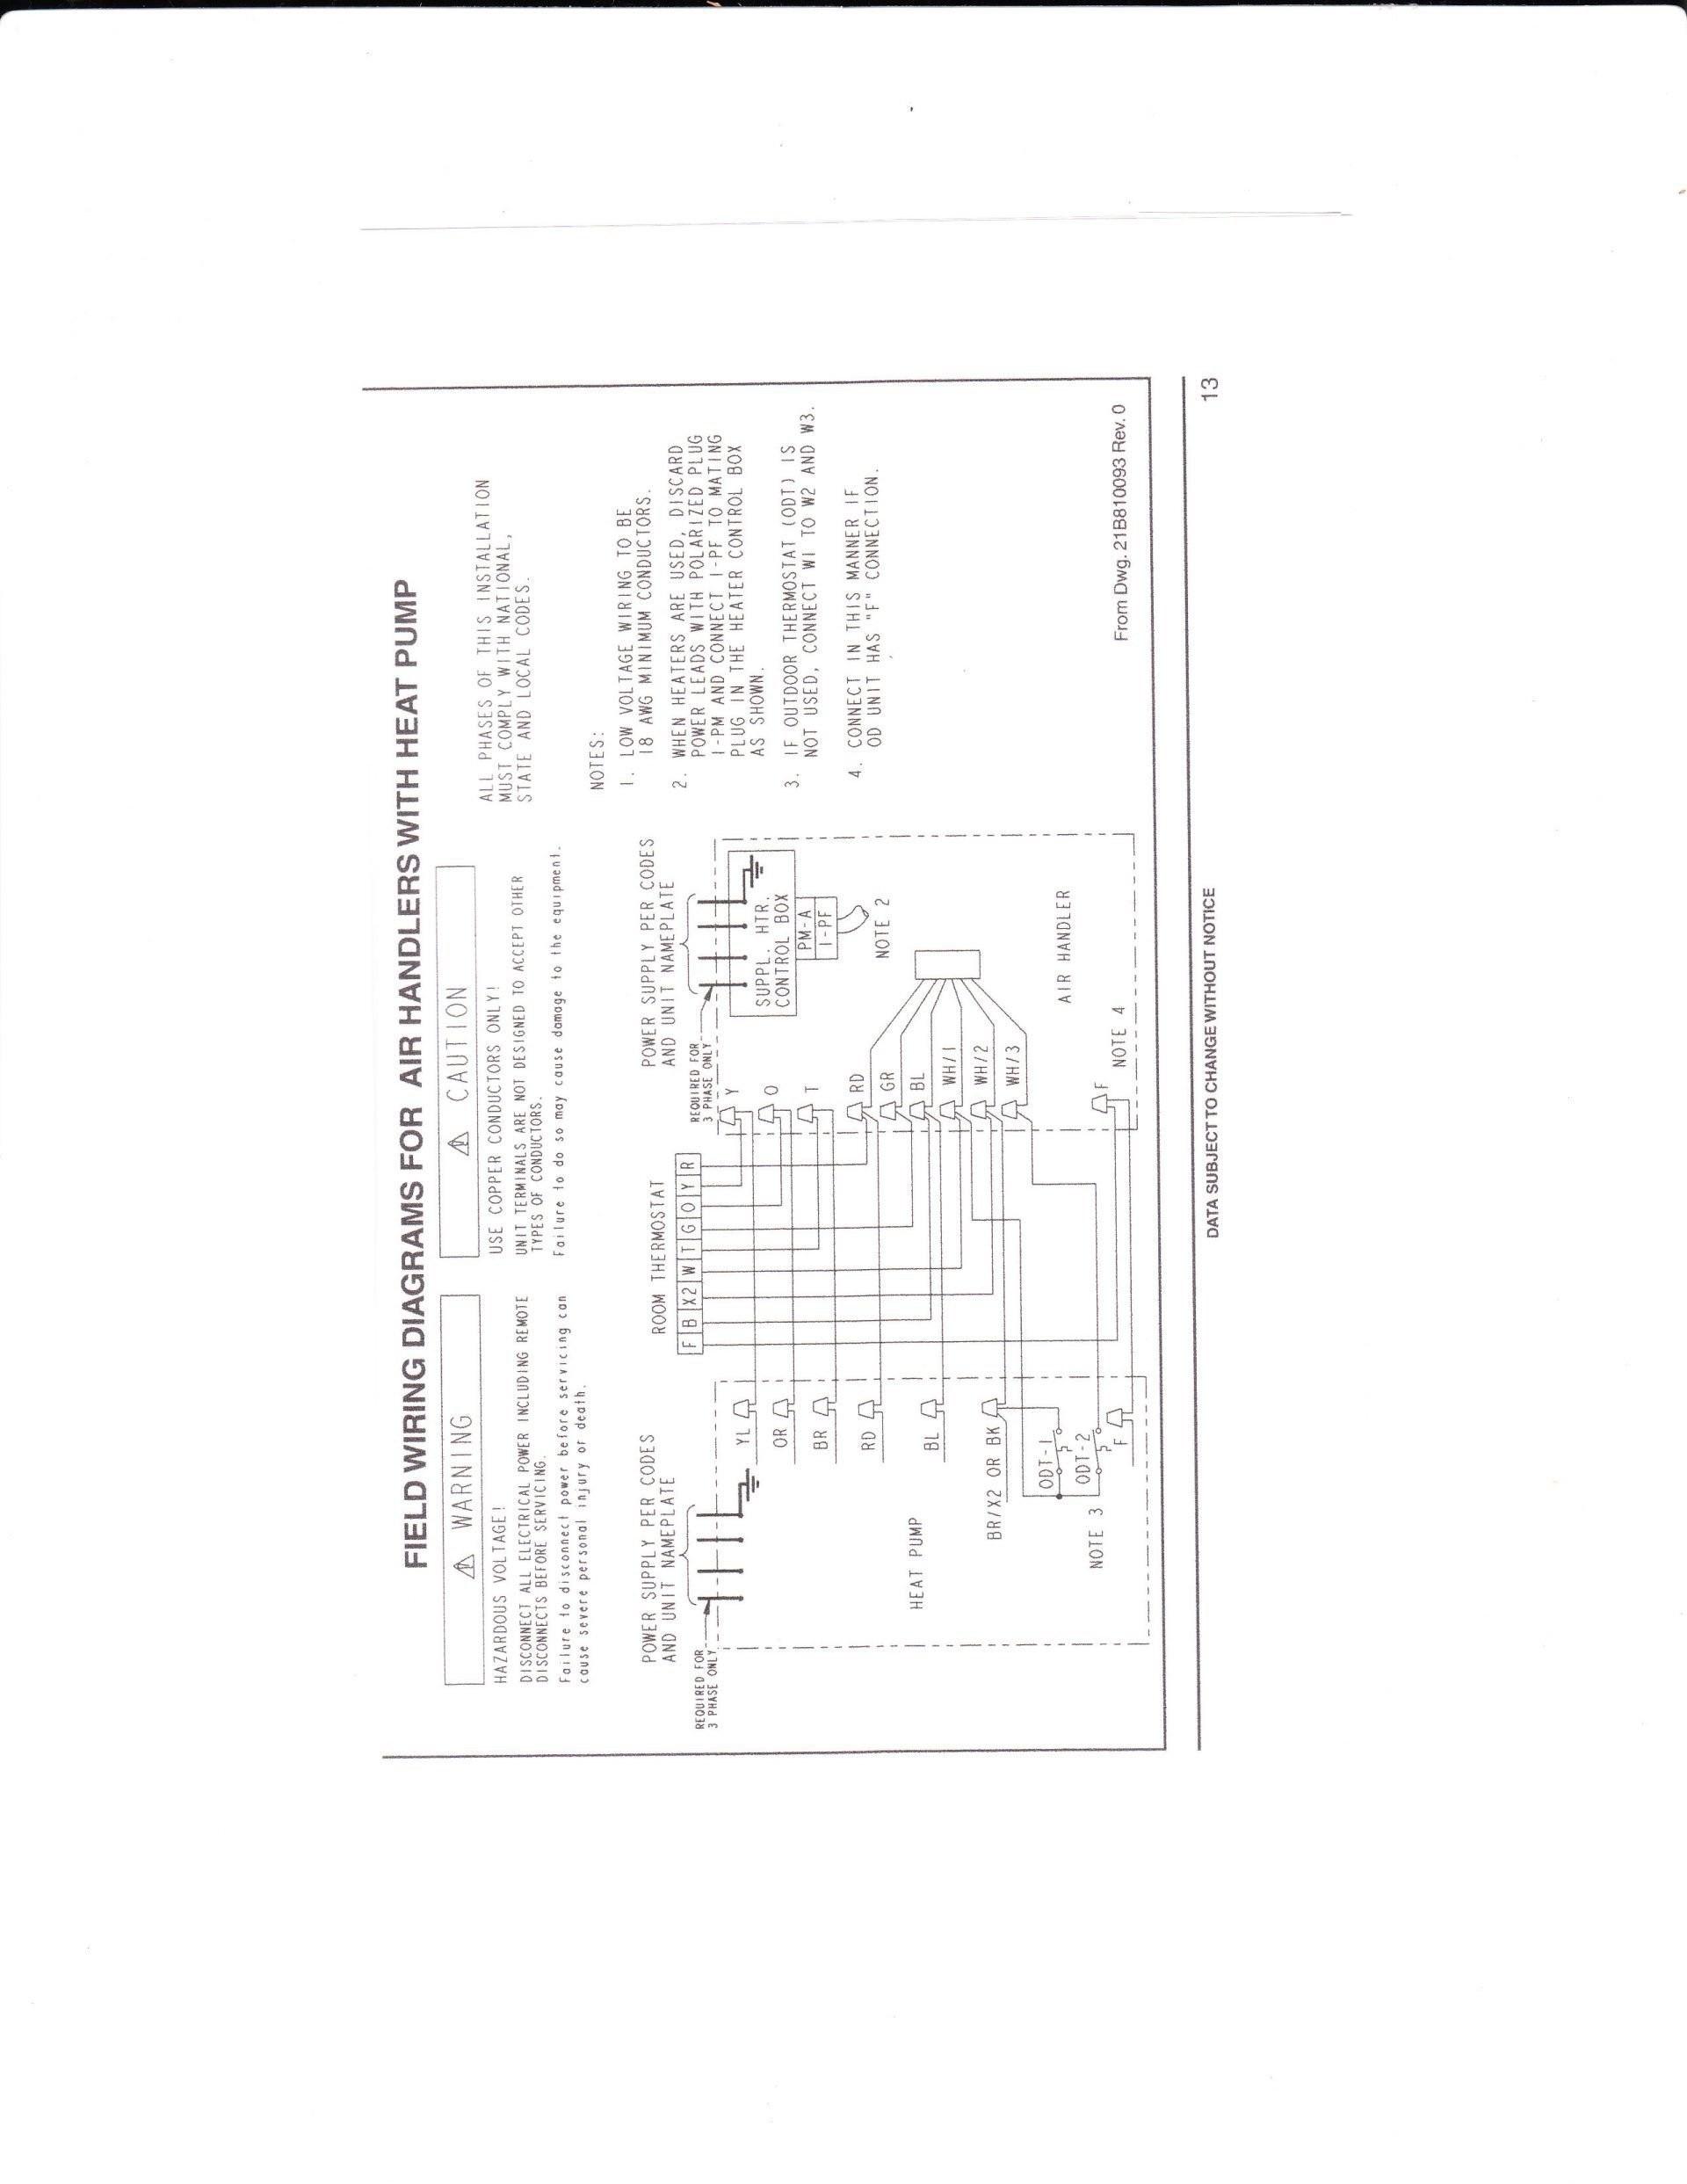 Electric Heat Wiring Diagram Goodman Heat Sequencer Wire Diagram Wiring Diagram Paper Of Electric Heat Wiring Diagram